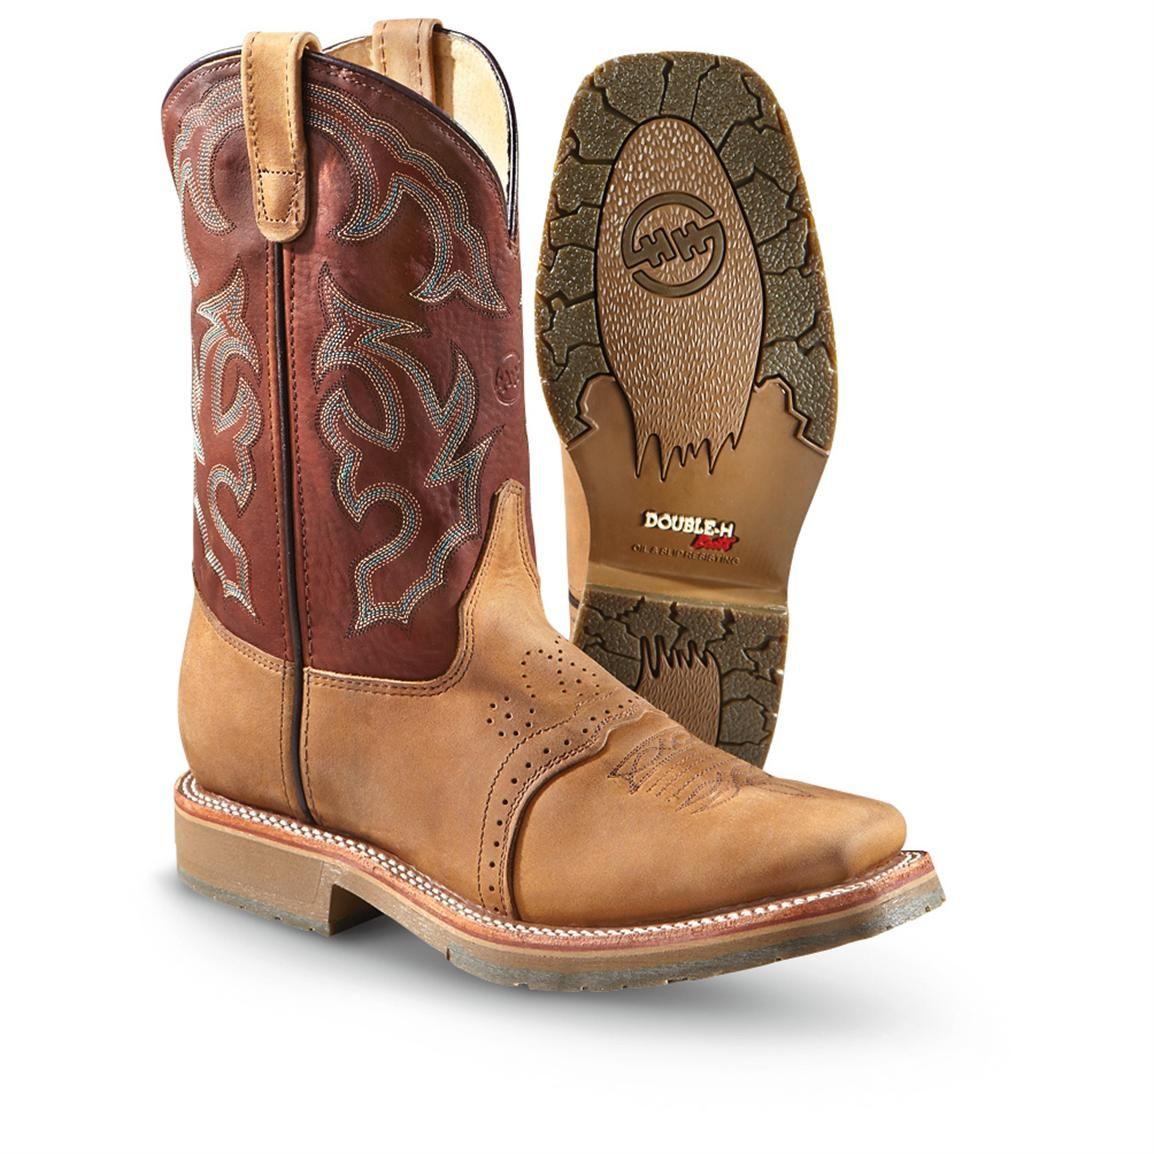 bb6c4e1d58c Men's Double-H Boots® Wildcat Western Work Boots, Chocolate | MATTS ...